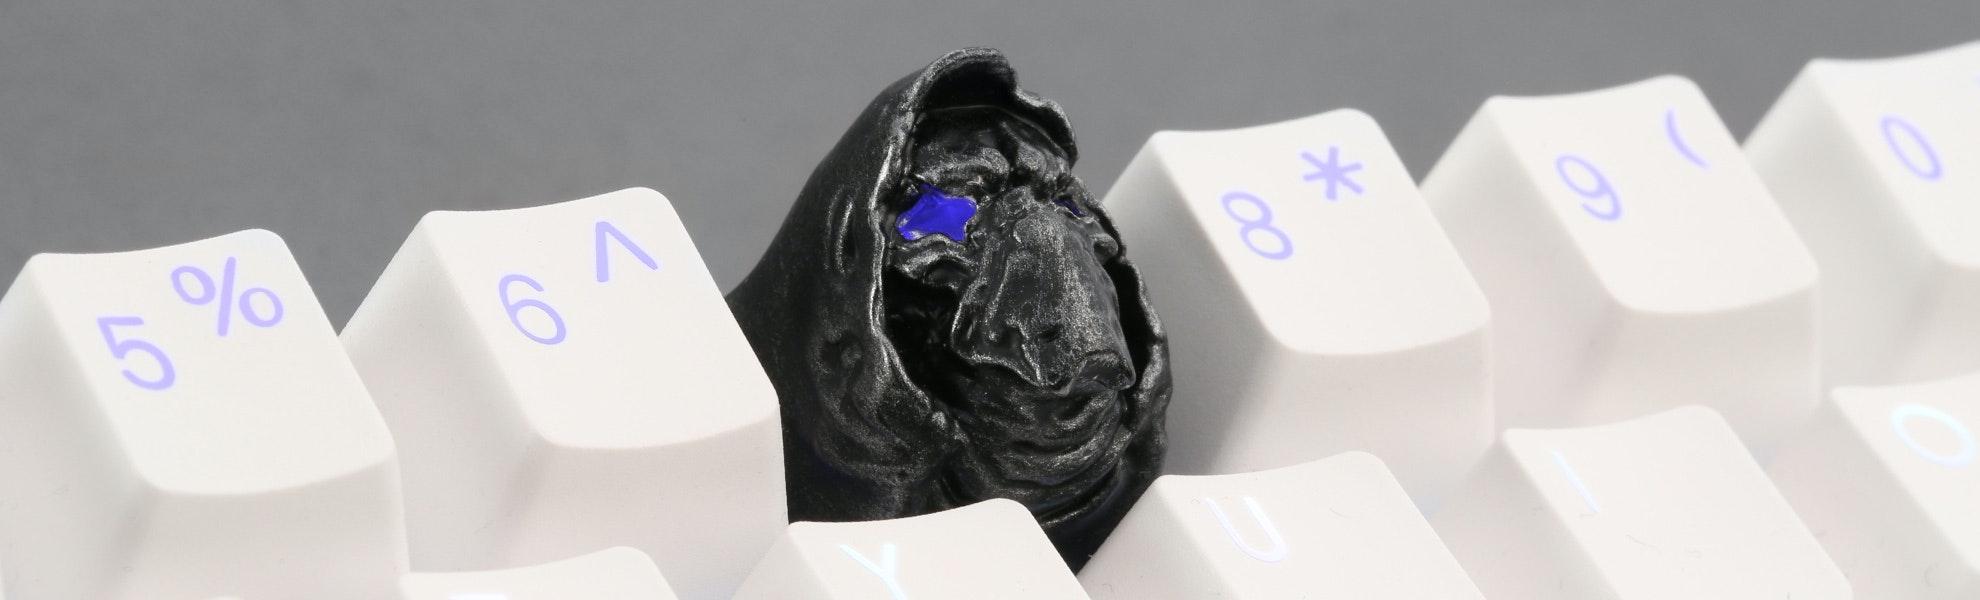 Evil Silence Artisan Keycap